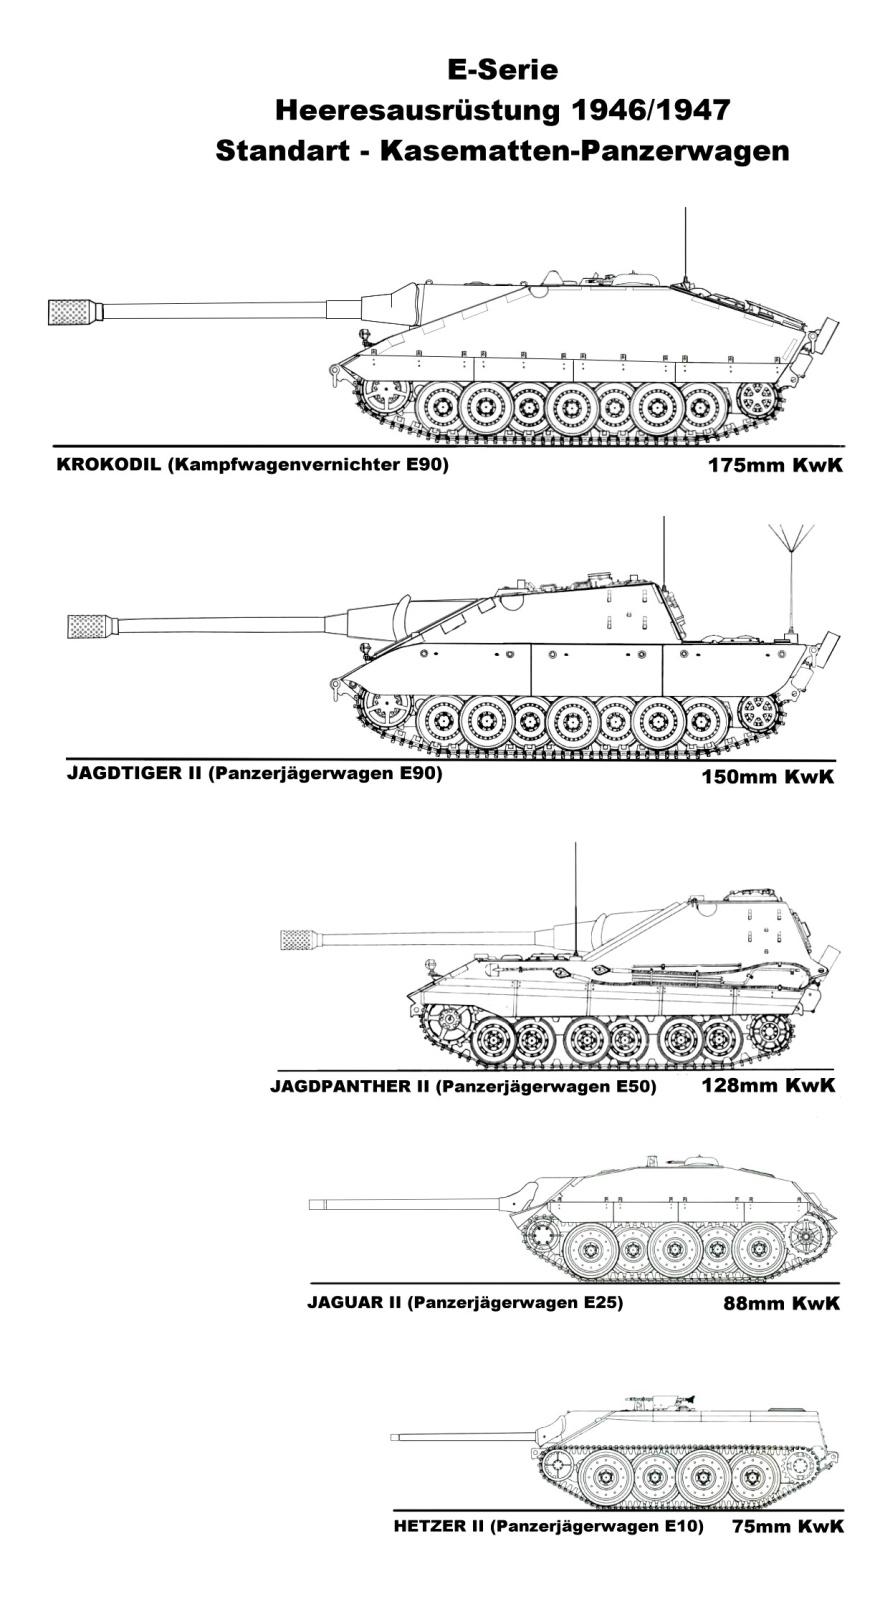 Petition Against The E 100 Stug Model Tank Destroyers